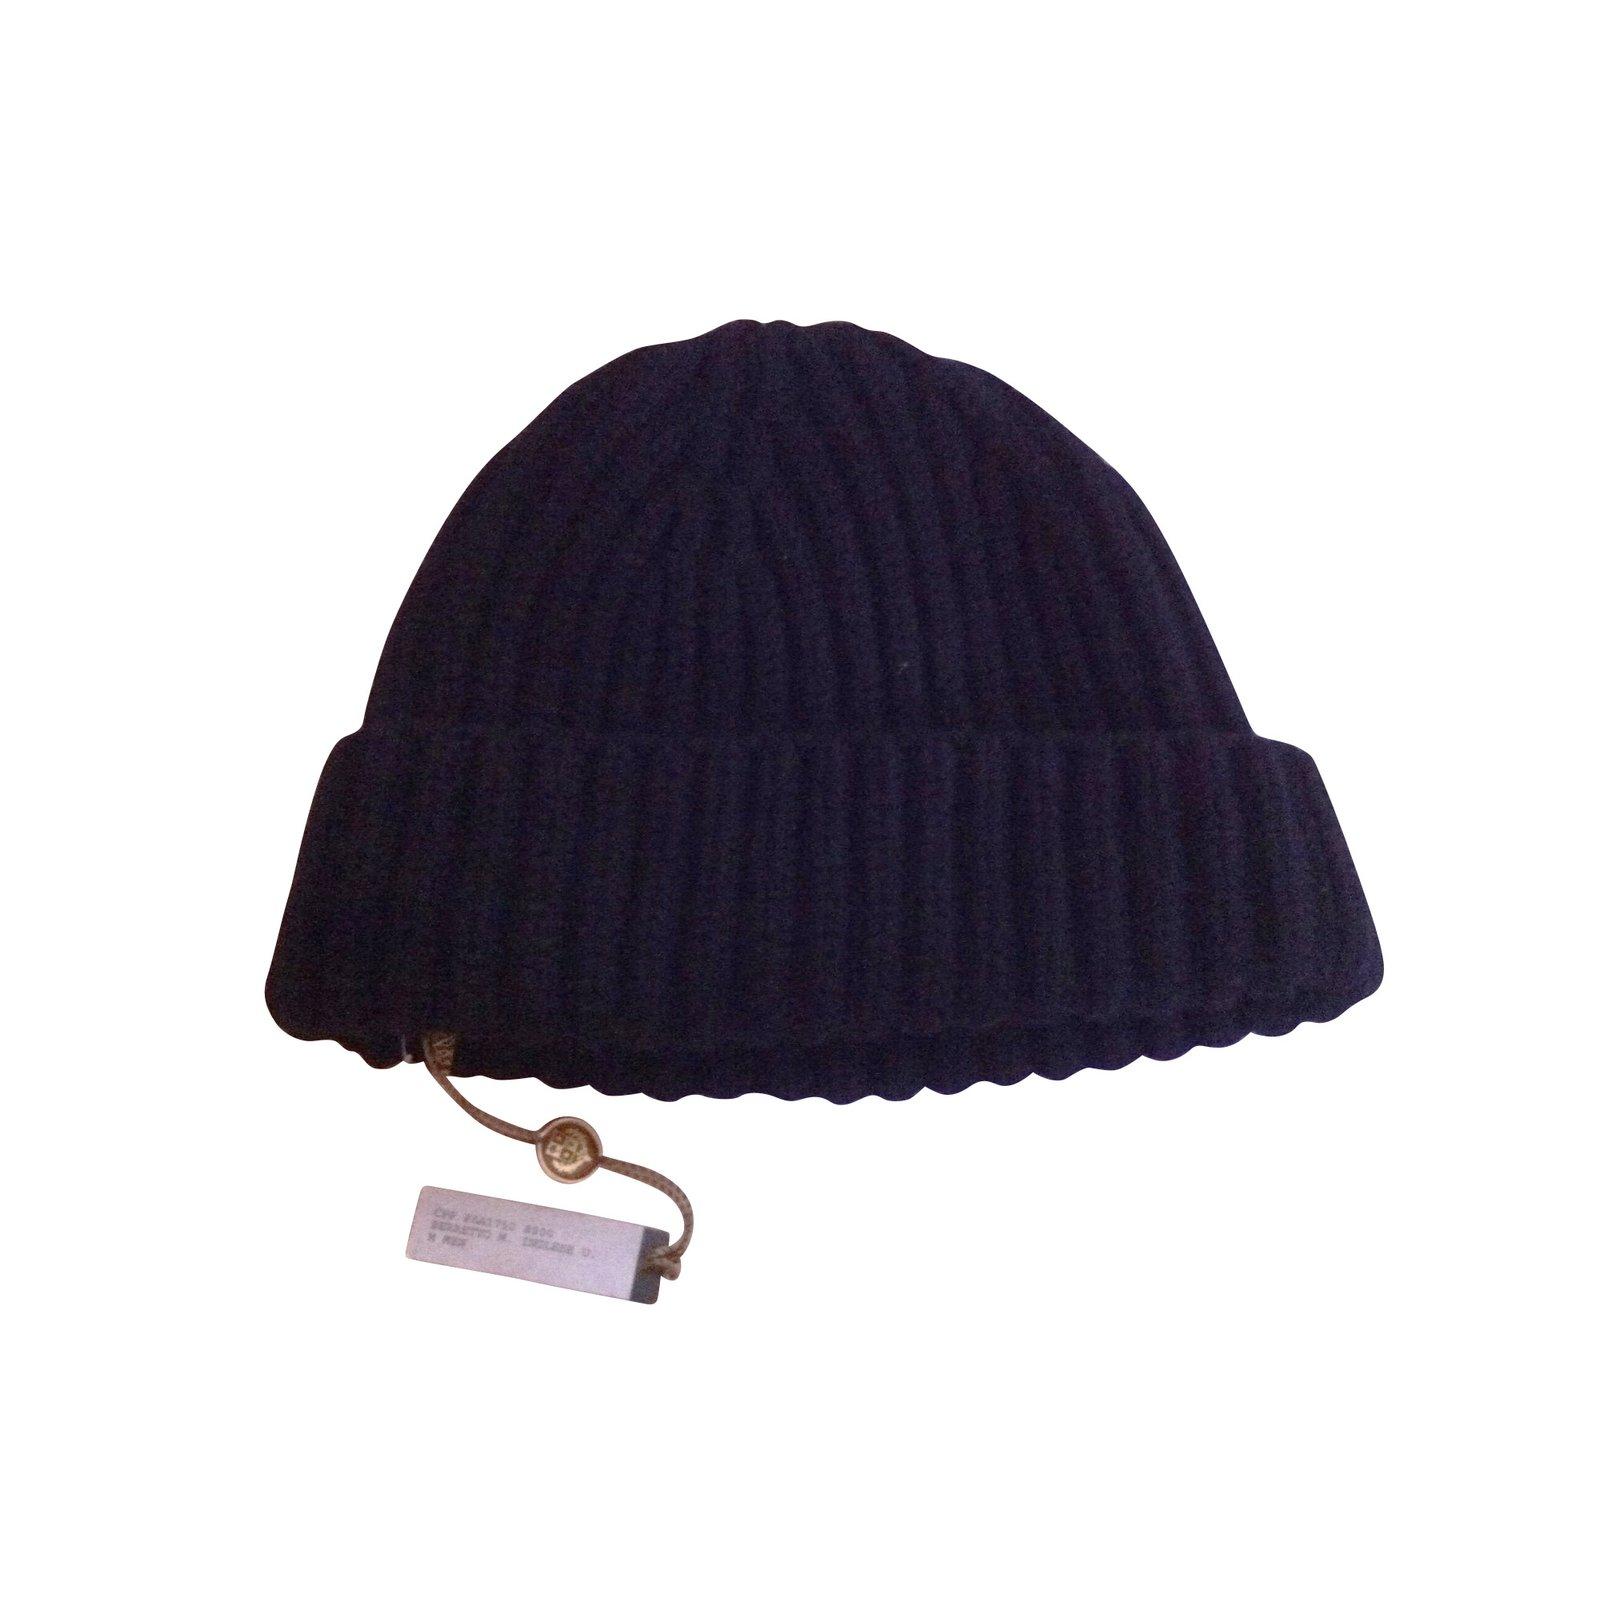 d92102e50e8 Loro Piana Hats Beanies Cashmere Black Ref 10584 Joli